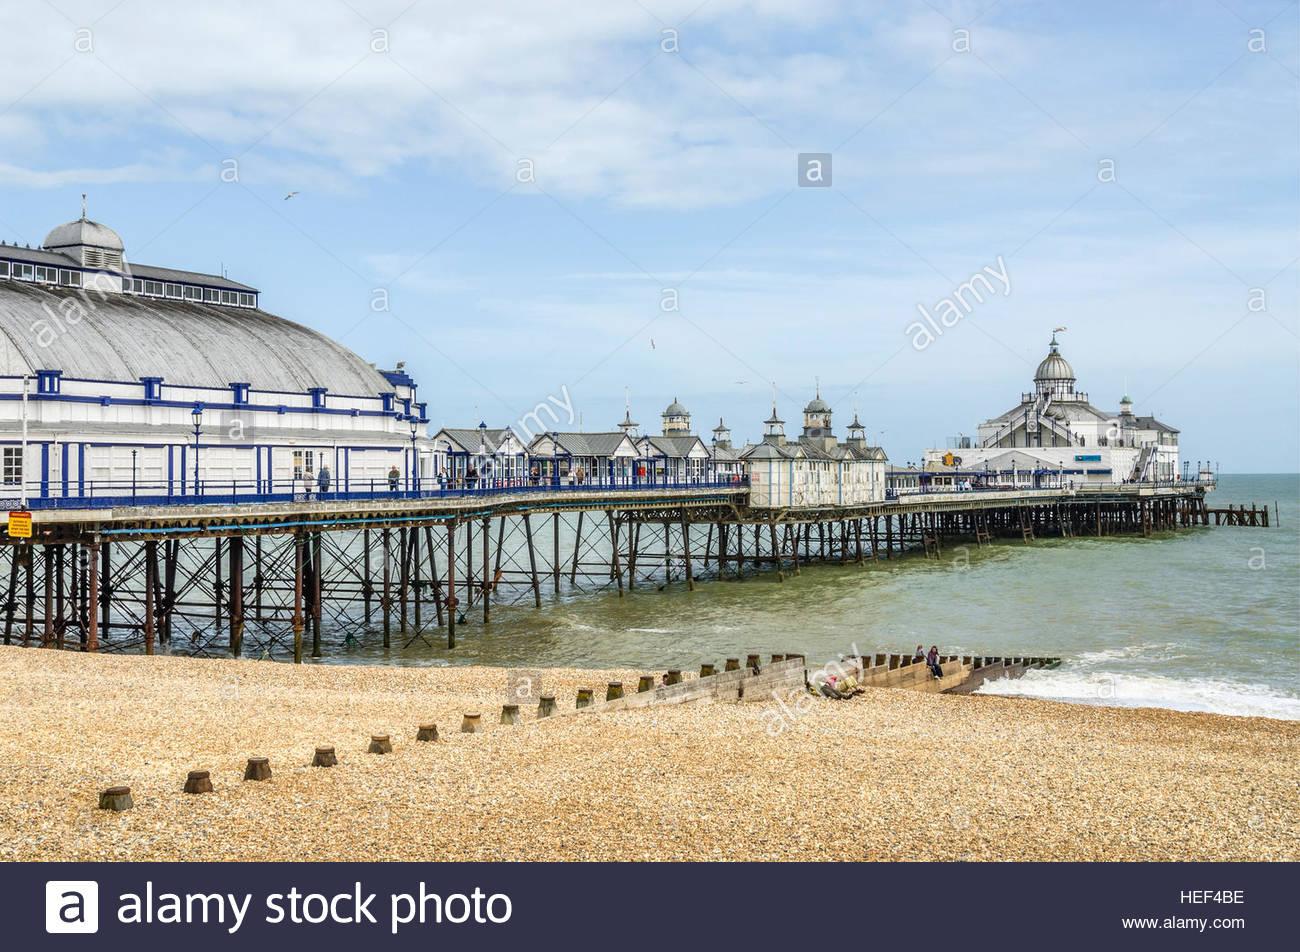 Vista sul lungomare di Eastbourne Pier, East Sussex, Sud Inghilterra | Aussicht ueber die Strandpromenade von Eastbourne Immagini Stock